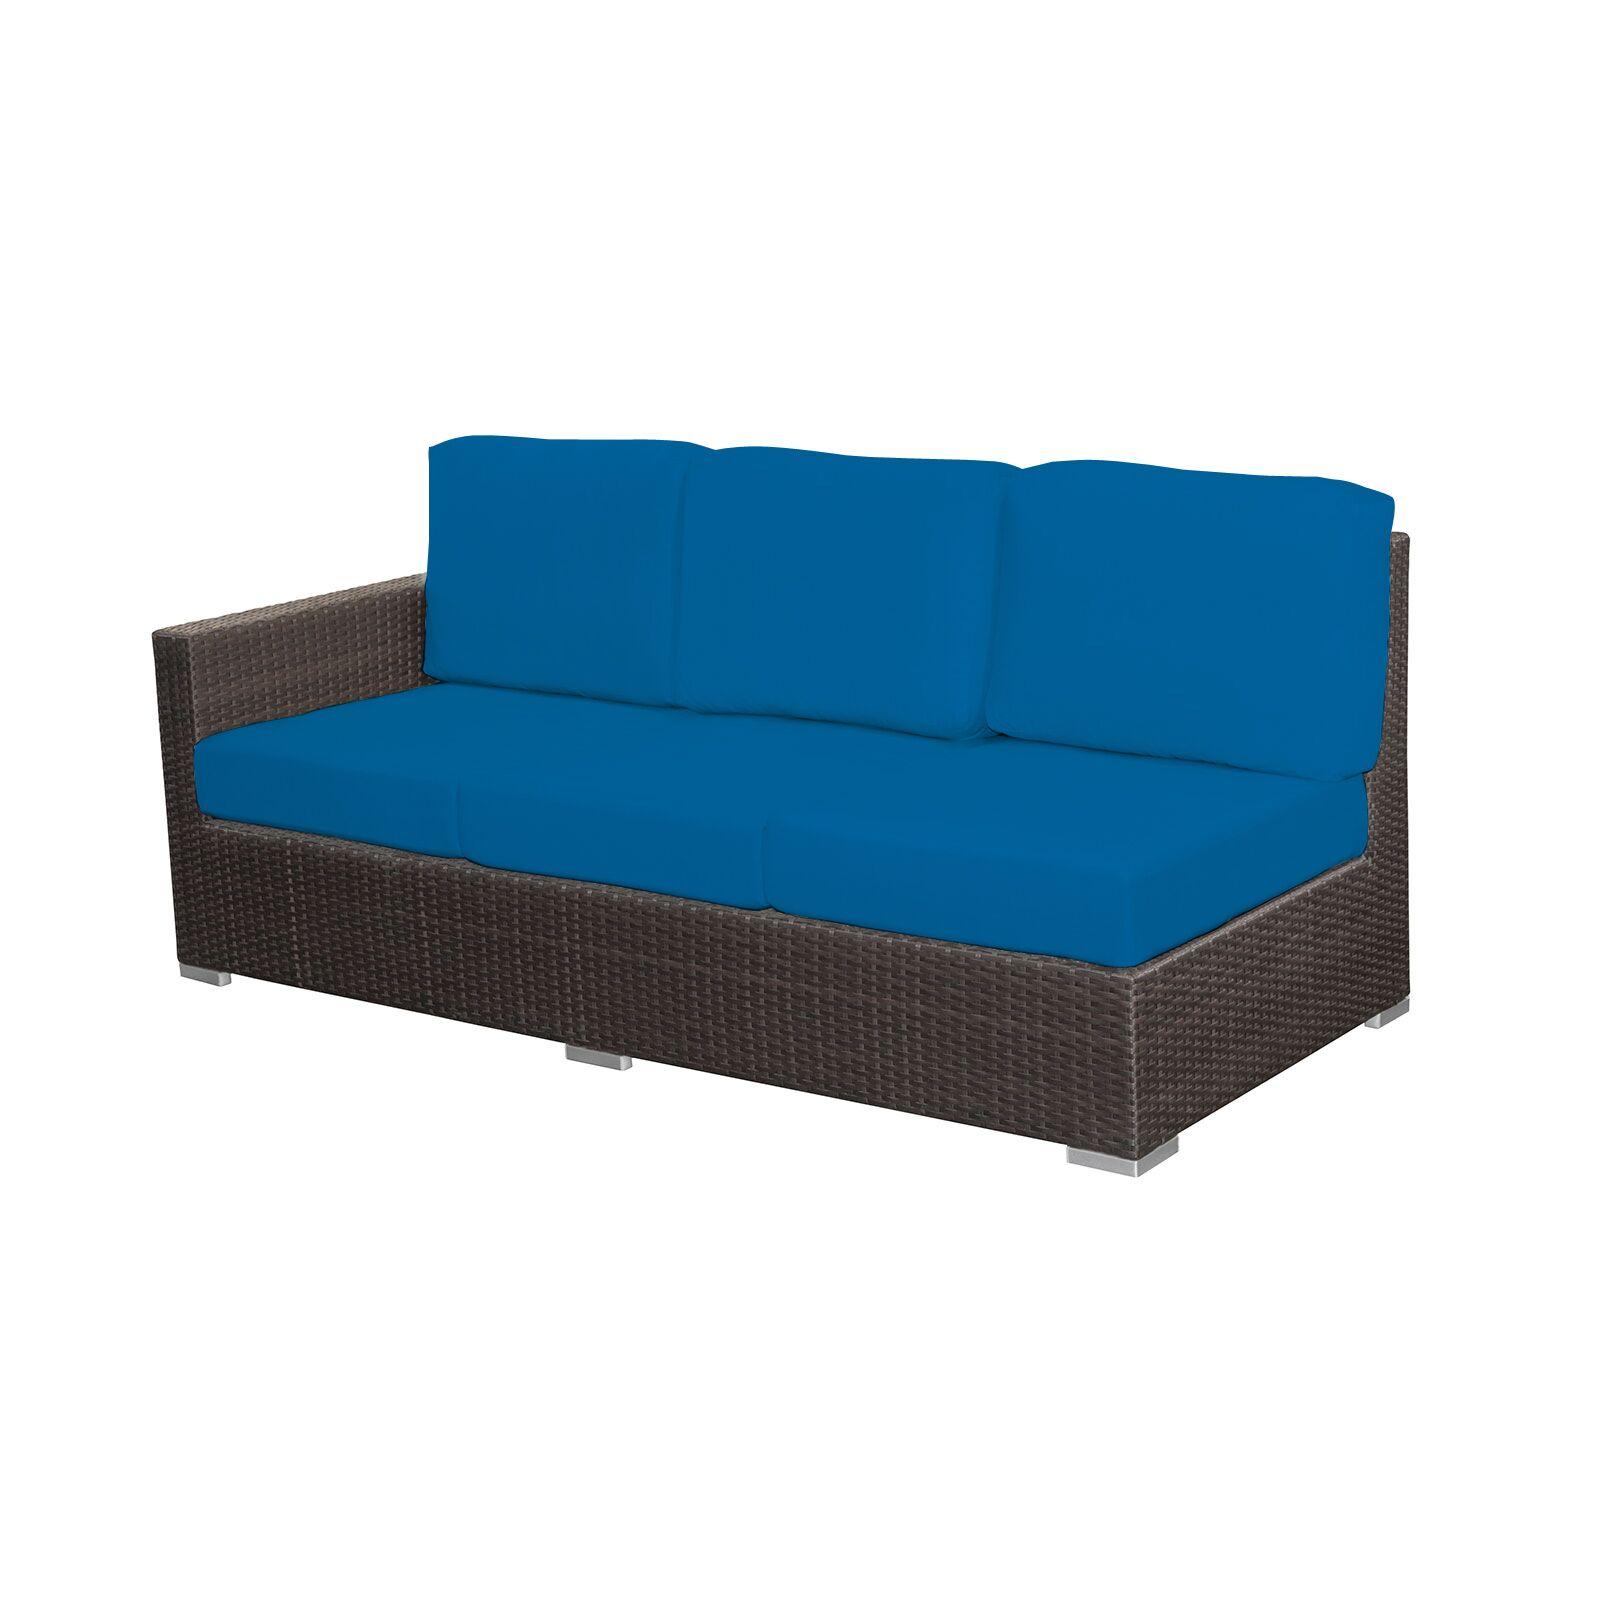 Ronning Left Arm Sofa Fabric: Sunbrella Pacific Blue